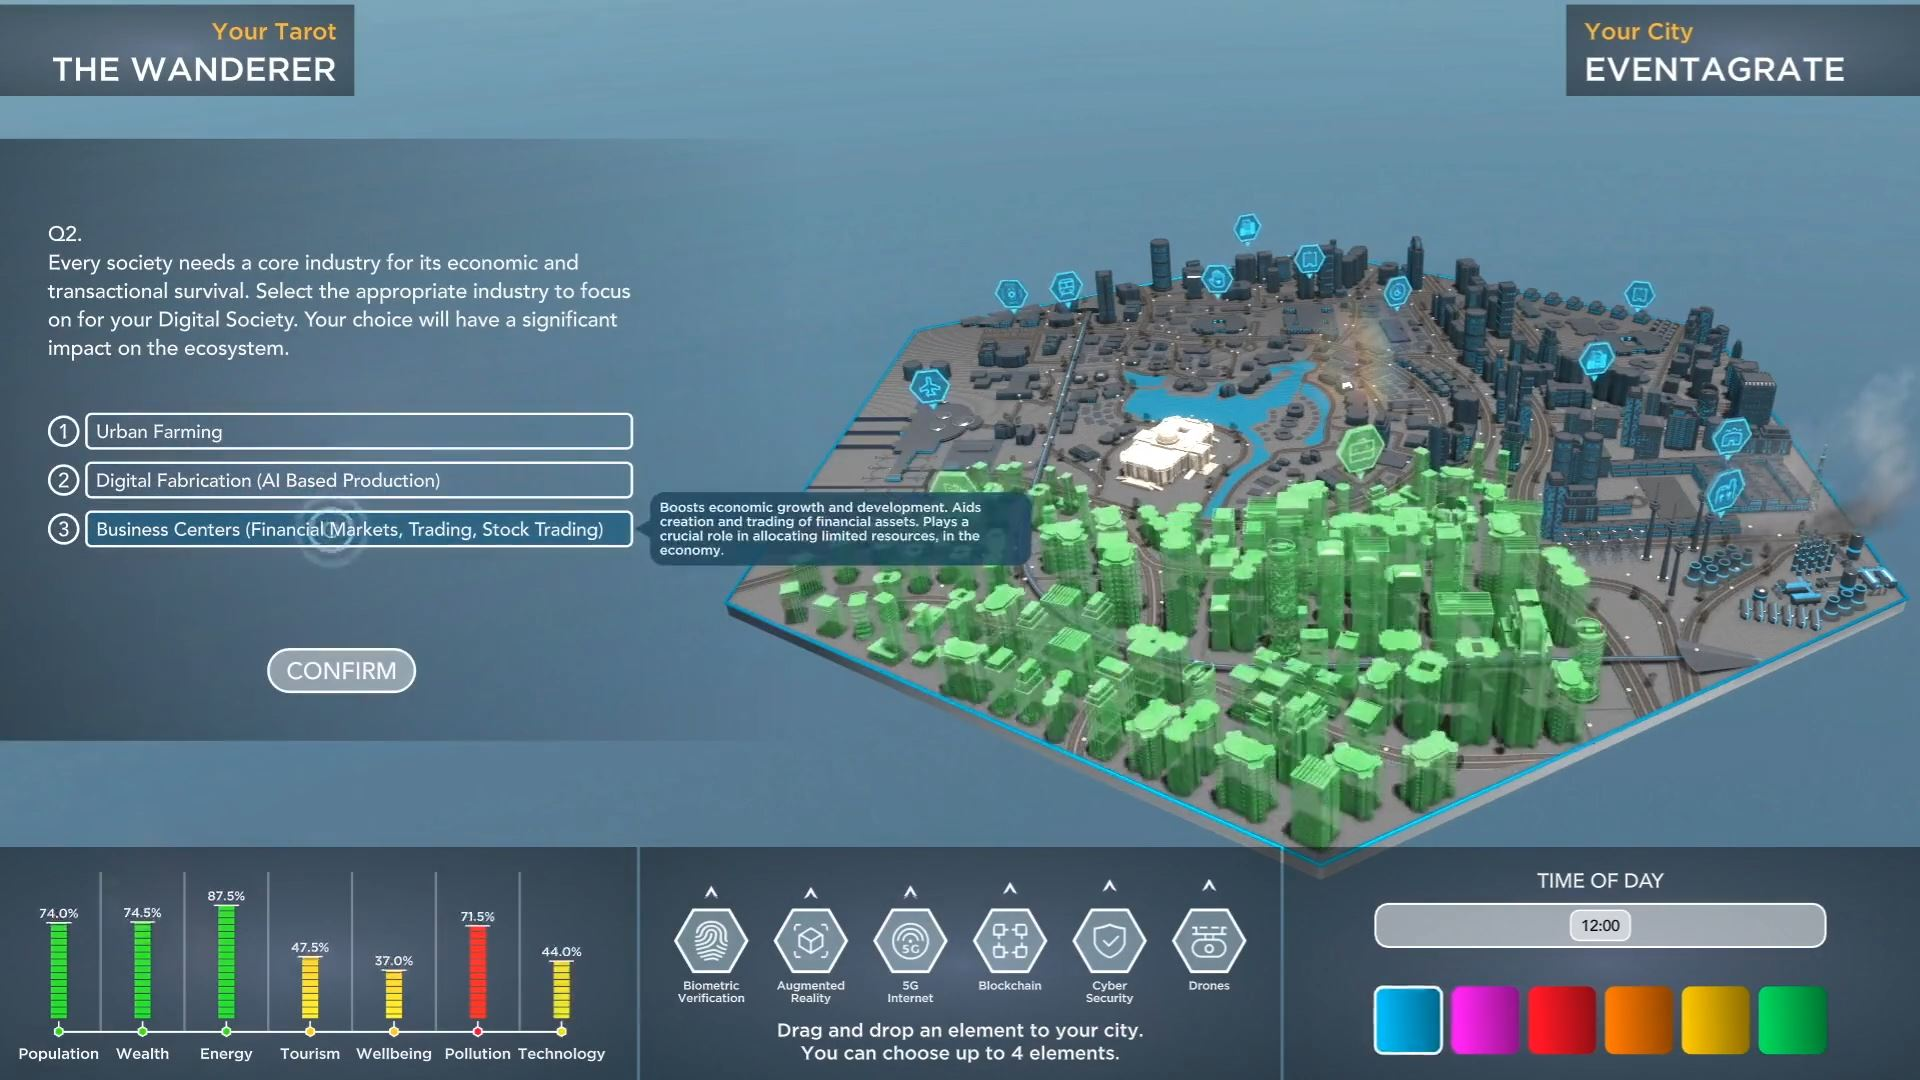 sharjah e-Government retreat interactive technology integration touchscreen graphics